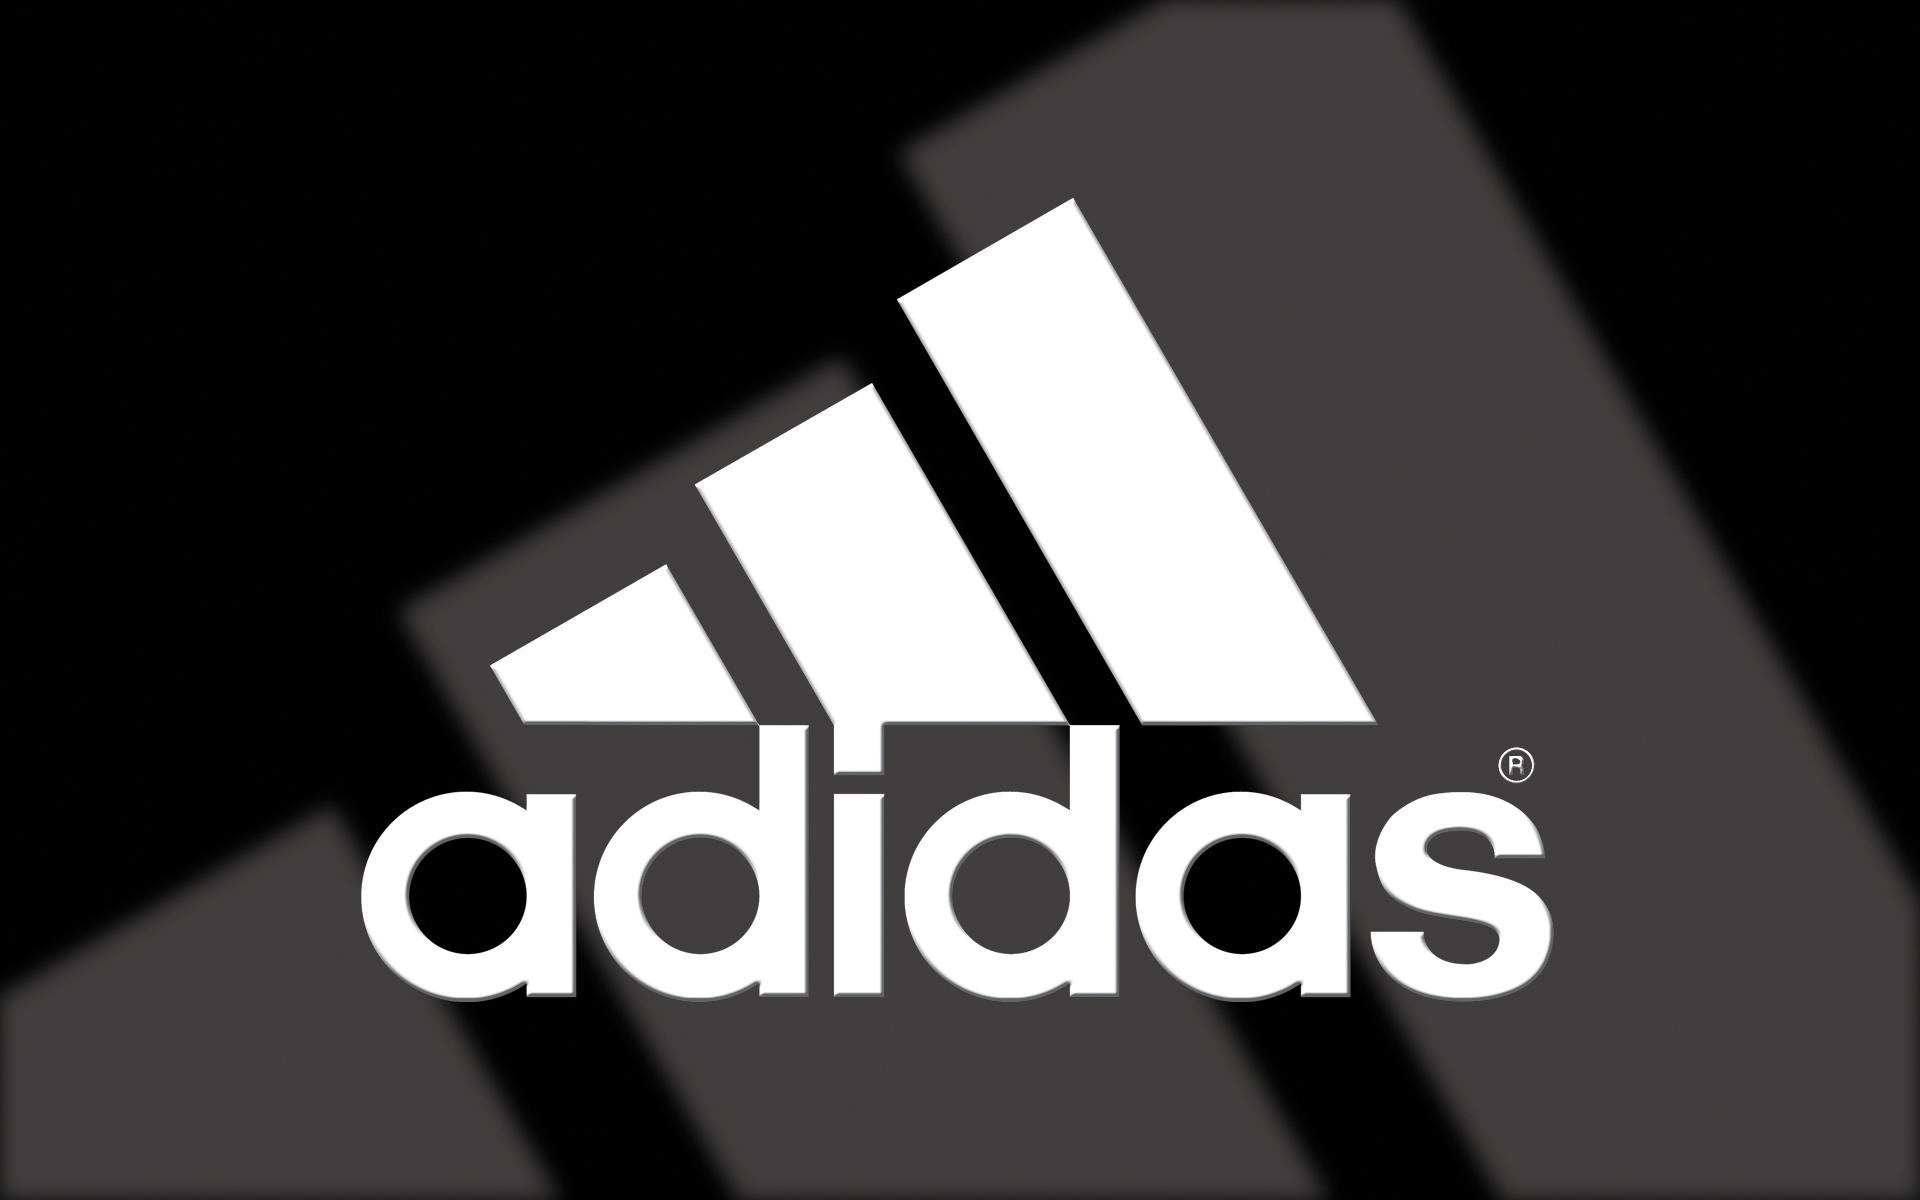 adidas 電腦桌布, 桌面背景 | 1920x1200 | ID:152938: wall.alphacoders.com/big.php?i=152938&lang=Chinese